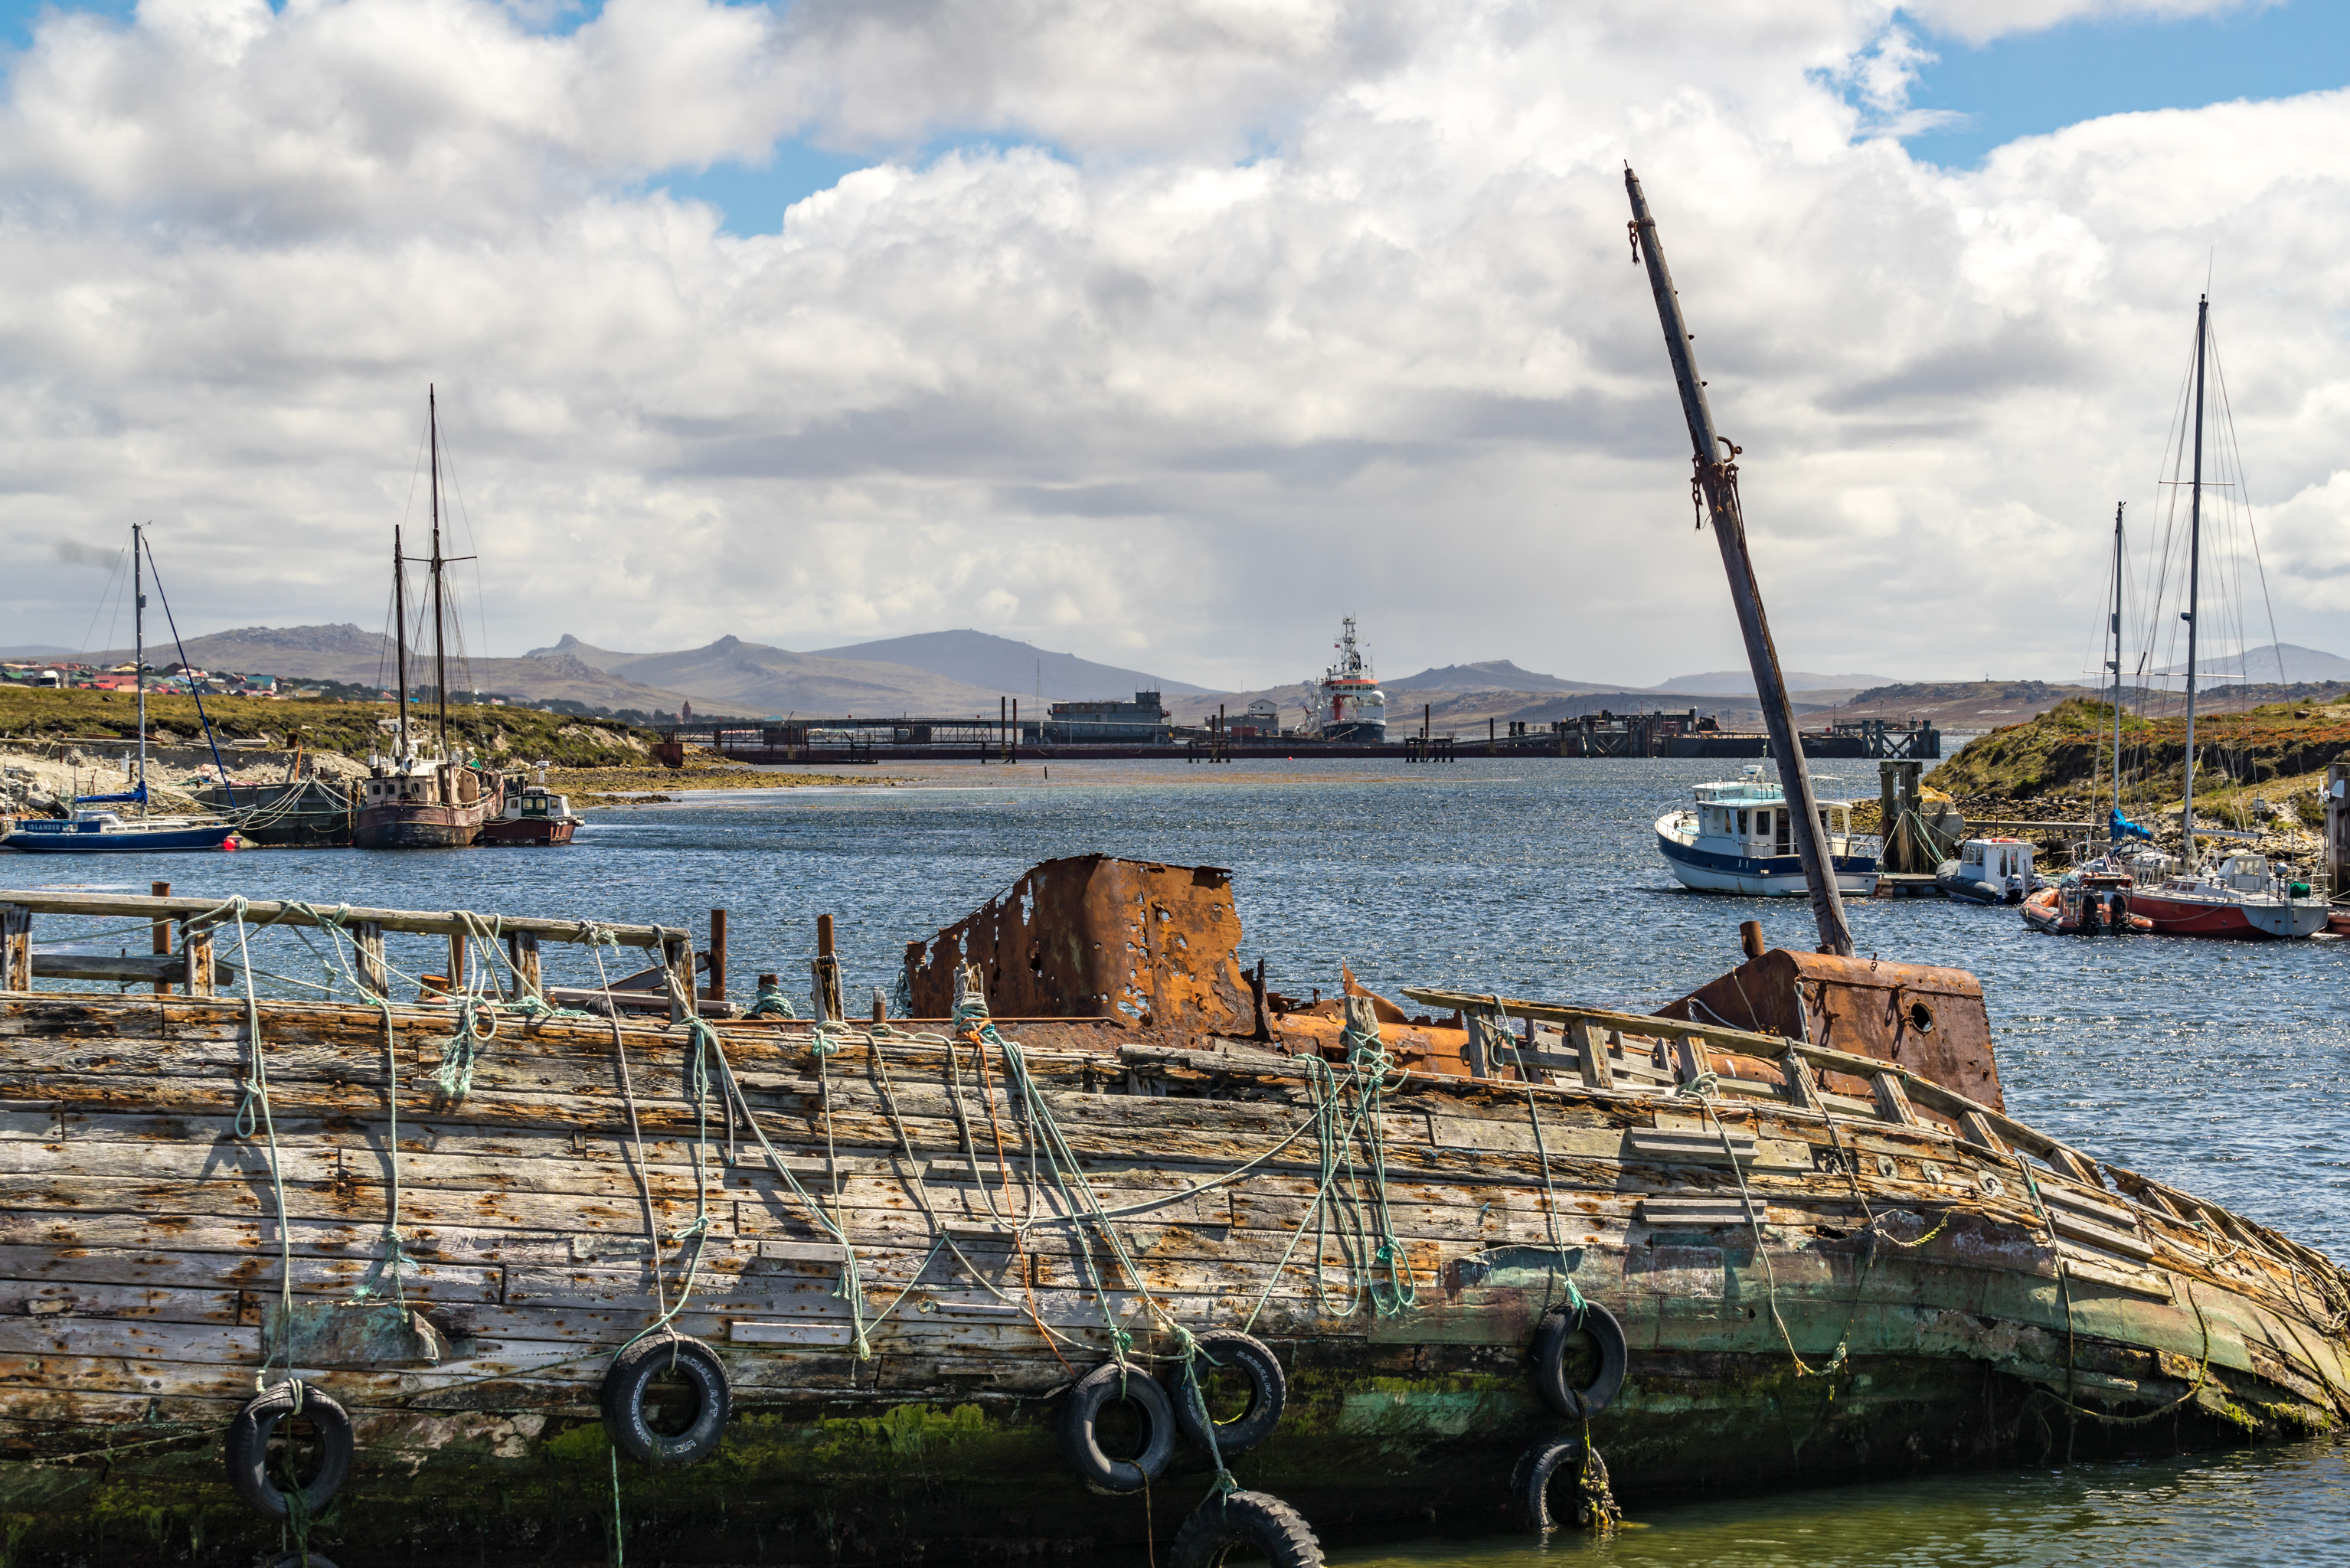 M133 & M134: Falklands - Port Stanley